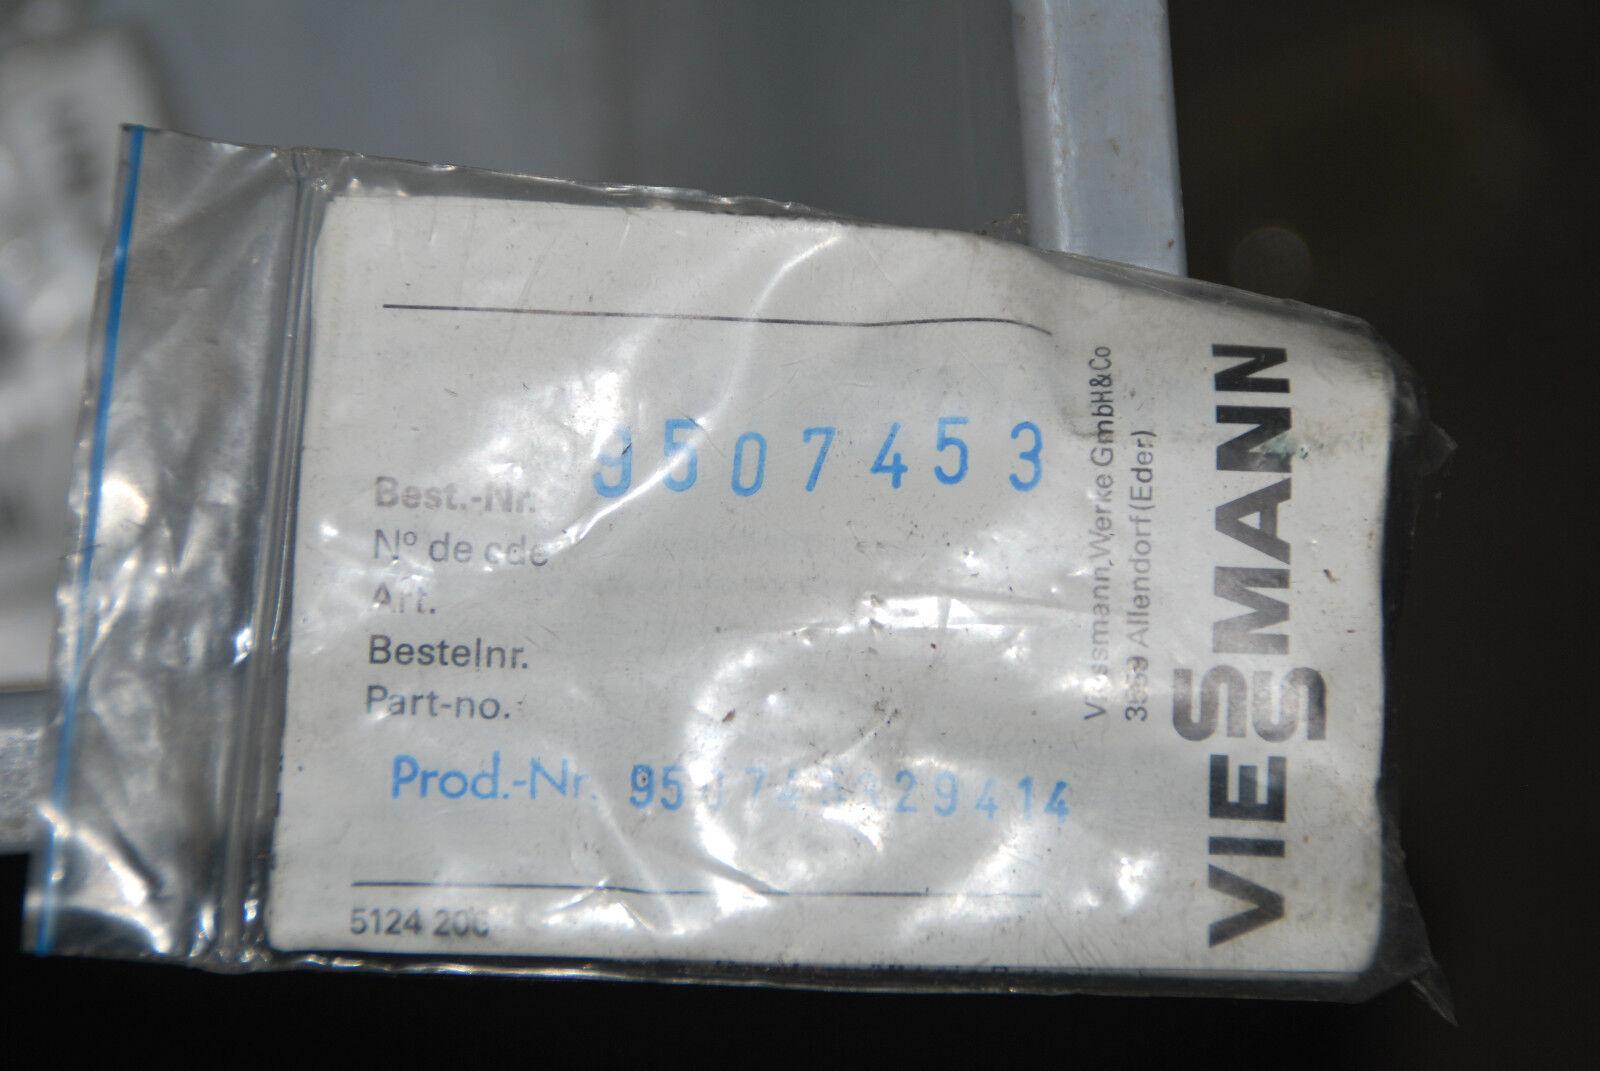 VIESSMANN 9507453 SPULE MAGNETVENTIL MAGNETSPULE NEU